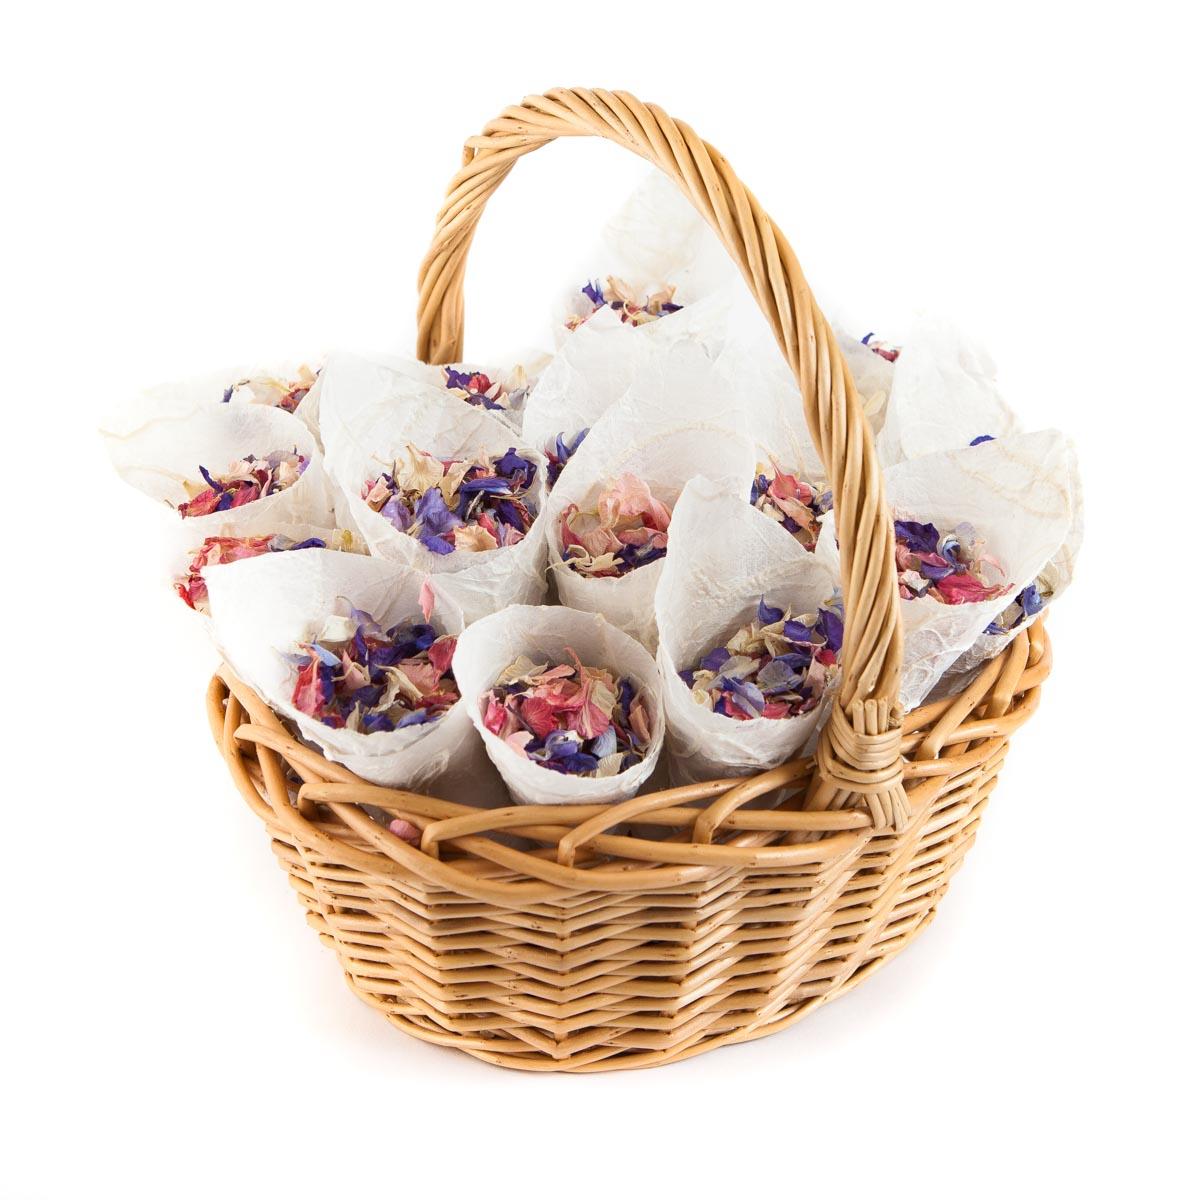 Flower girl baskets - Classic Basket - Rainbow Delphinium Petal confetti basket